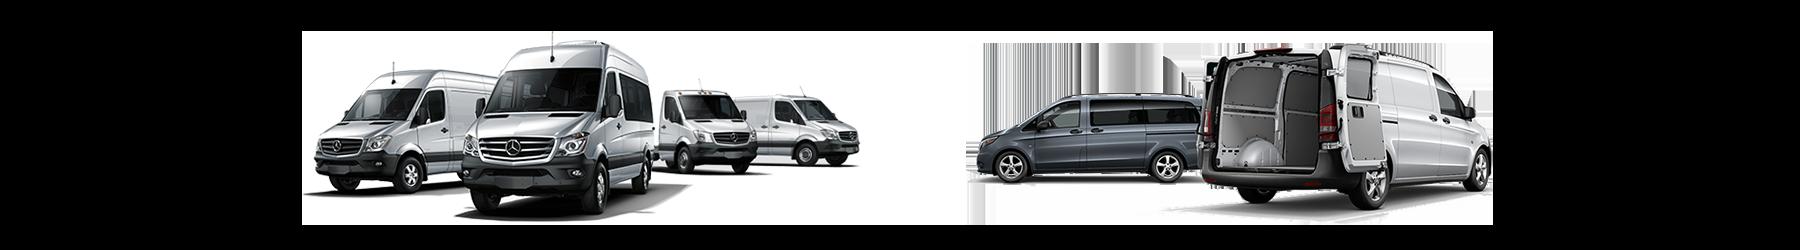 Sprinter and Metris Commercial Vans